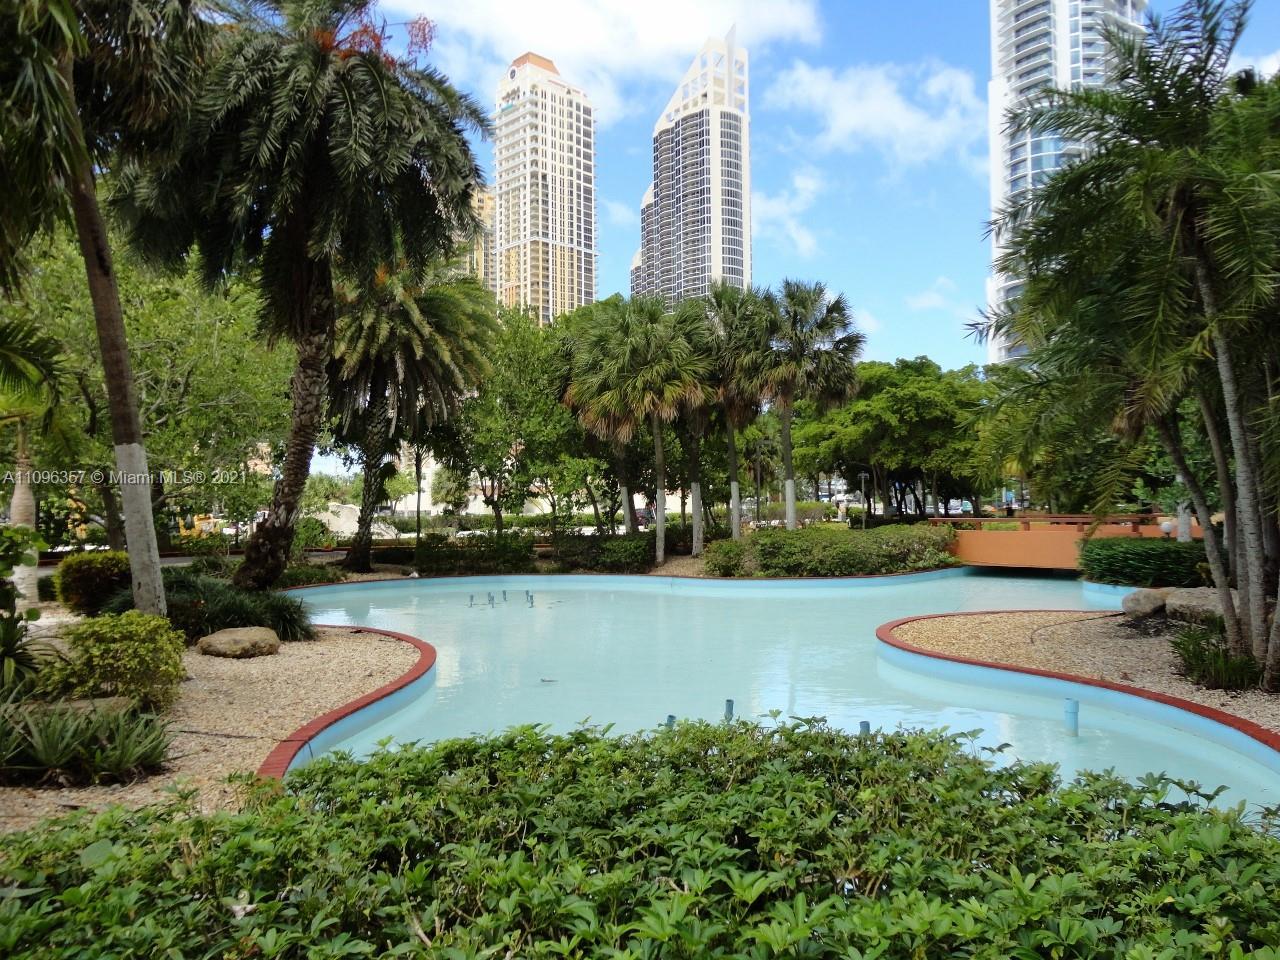 Winston Tower 600 #414 - 210 174 St #414, Sunny Isles Beach, FL 33160